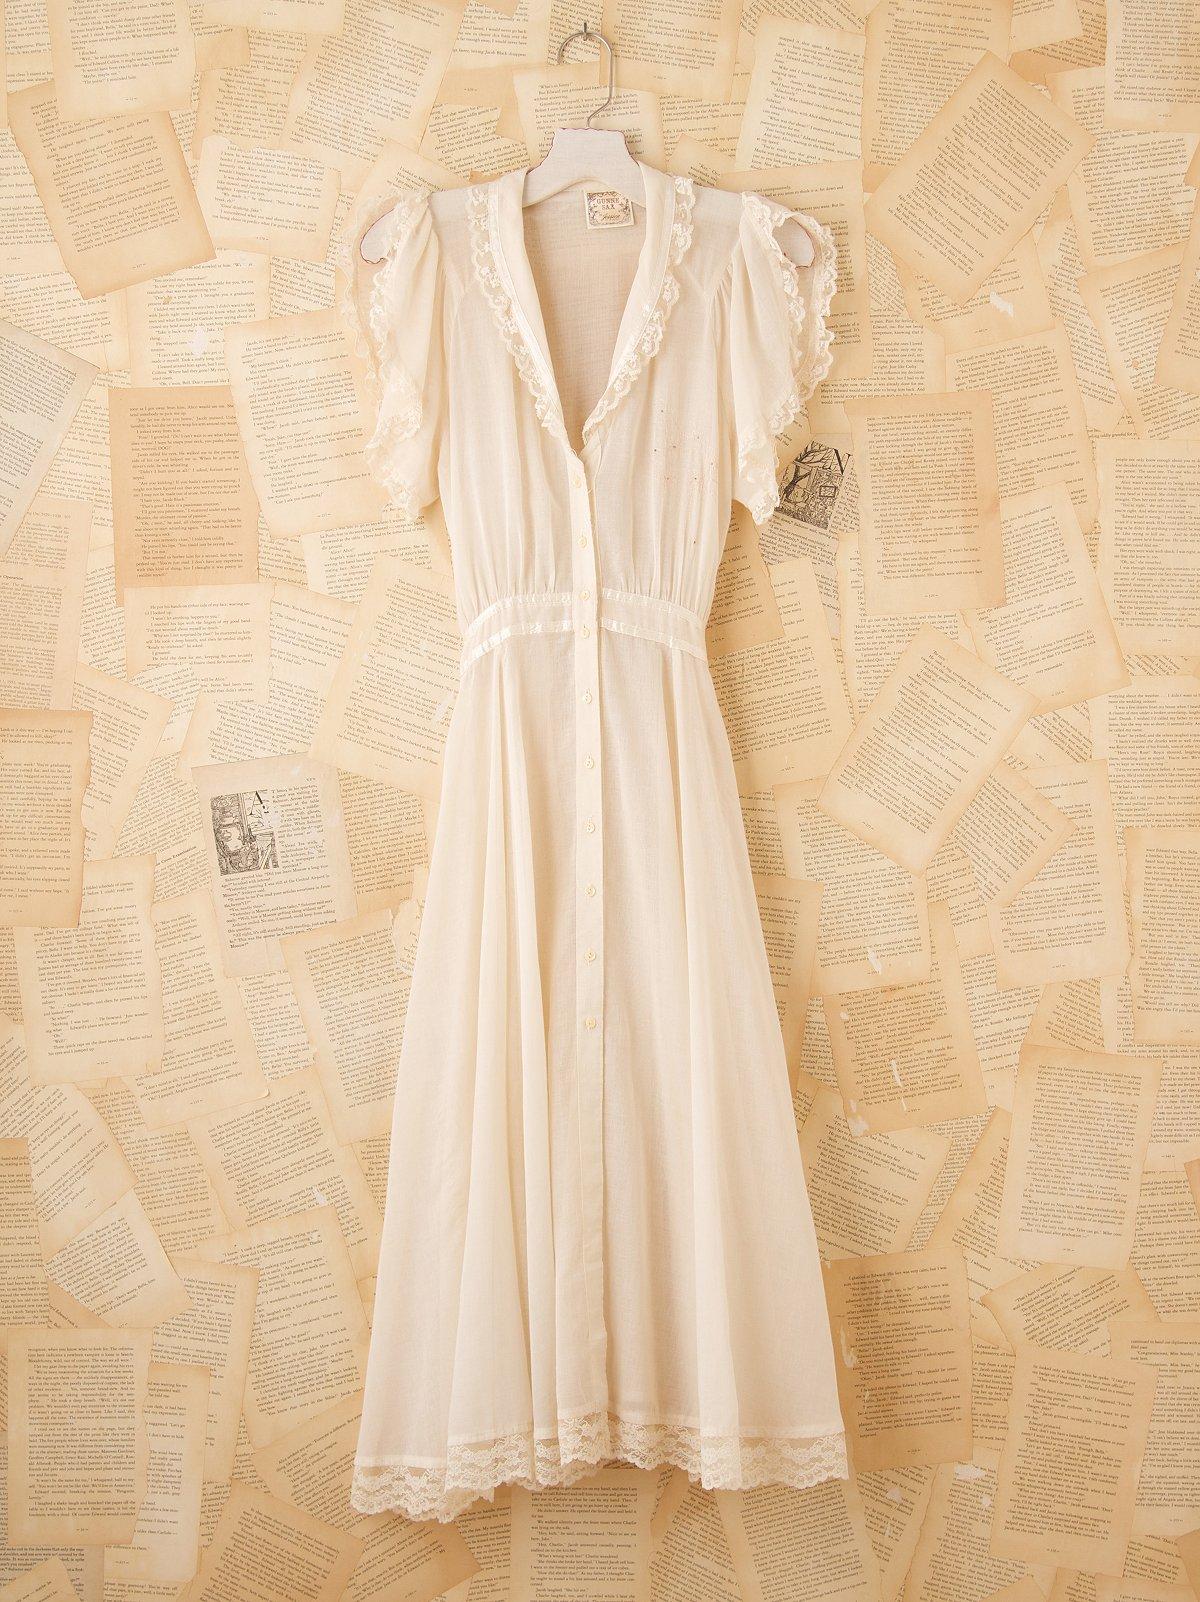 Vintage 1970s Gunne Sax Dress